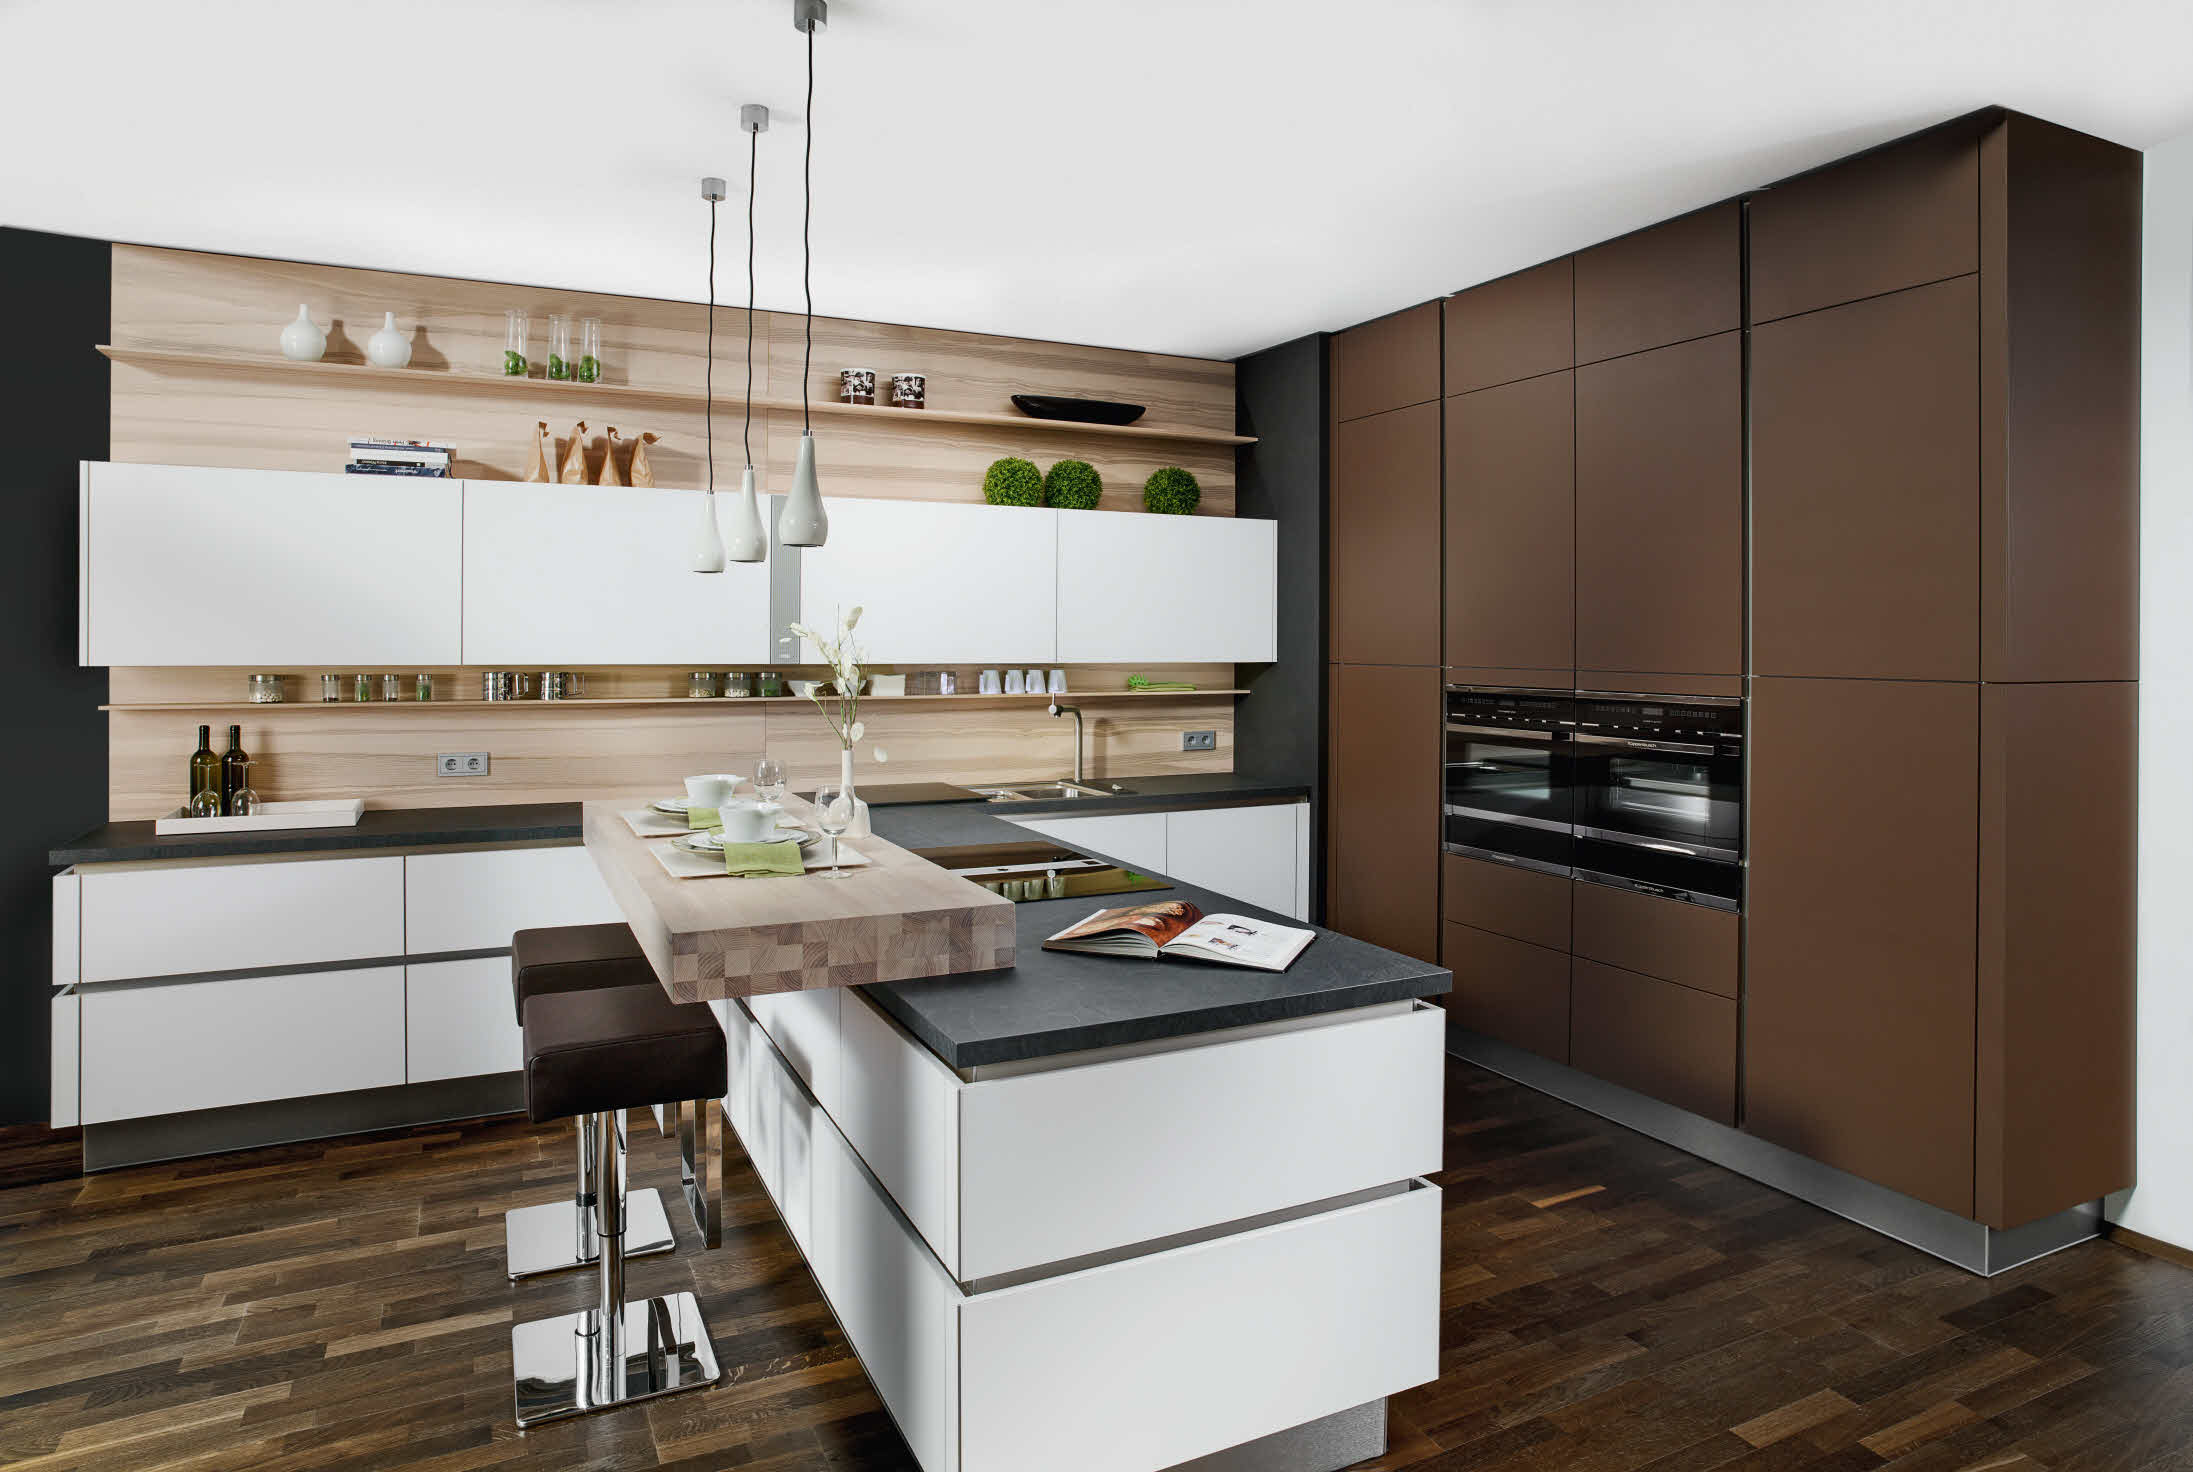 tiroler k chenstudio ewe k chen. Black Bedroom Furniture Sets. Home Design Ideas